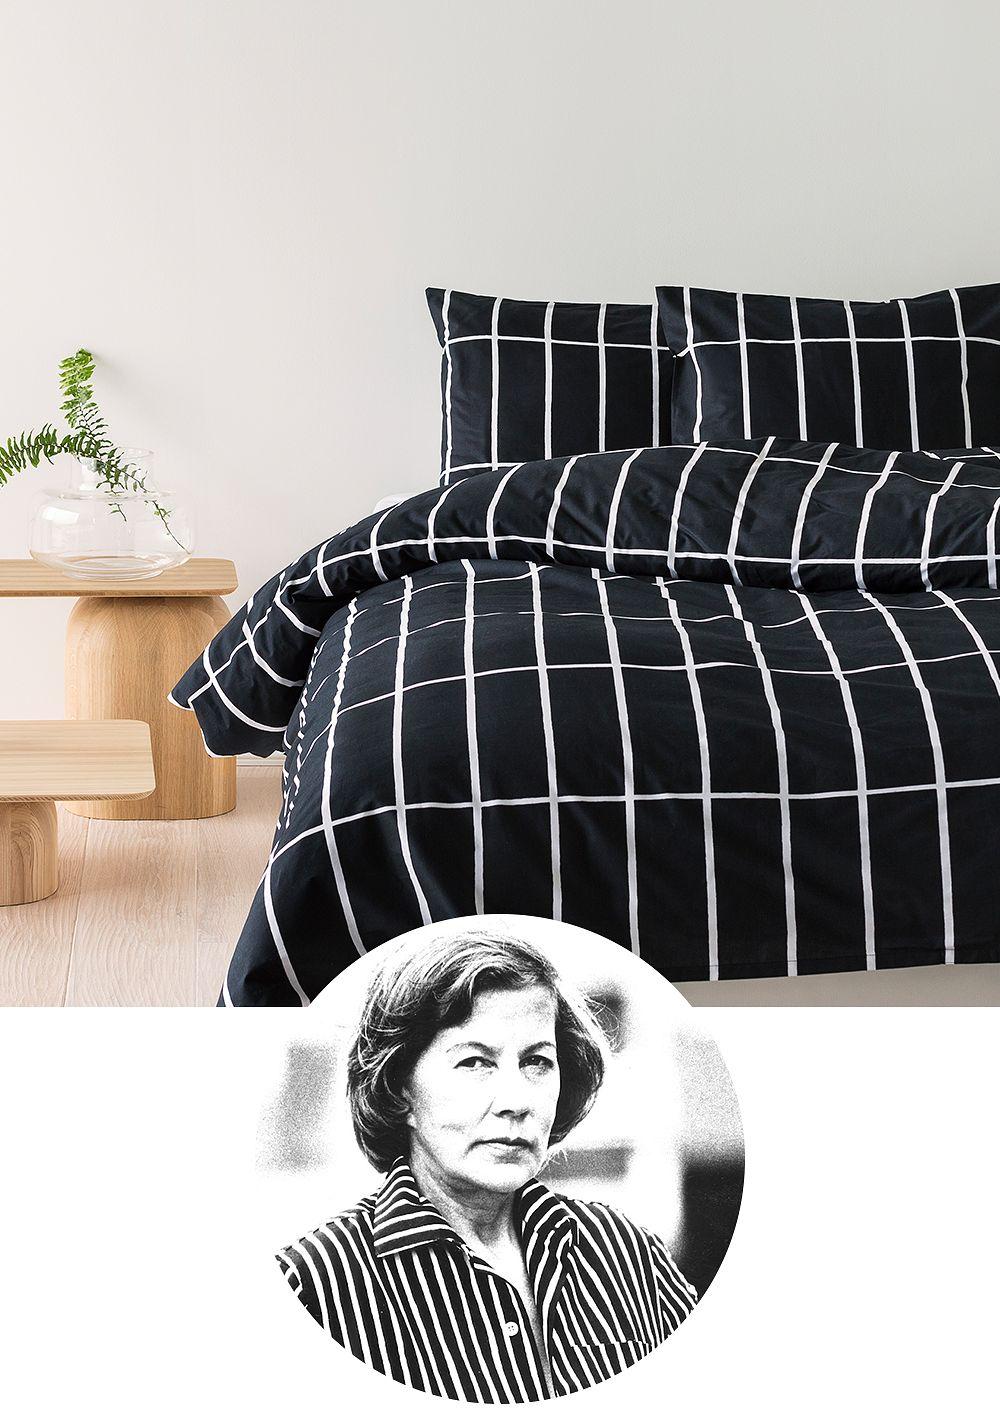 Designer Armi Ratia featuring her iconic Marimekko Tiiliskivi pattern.